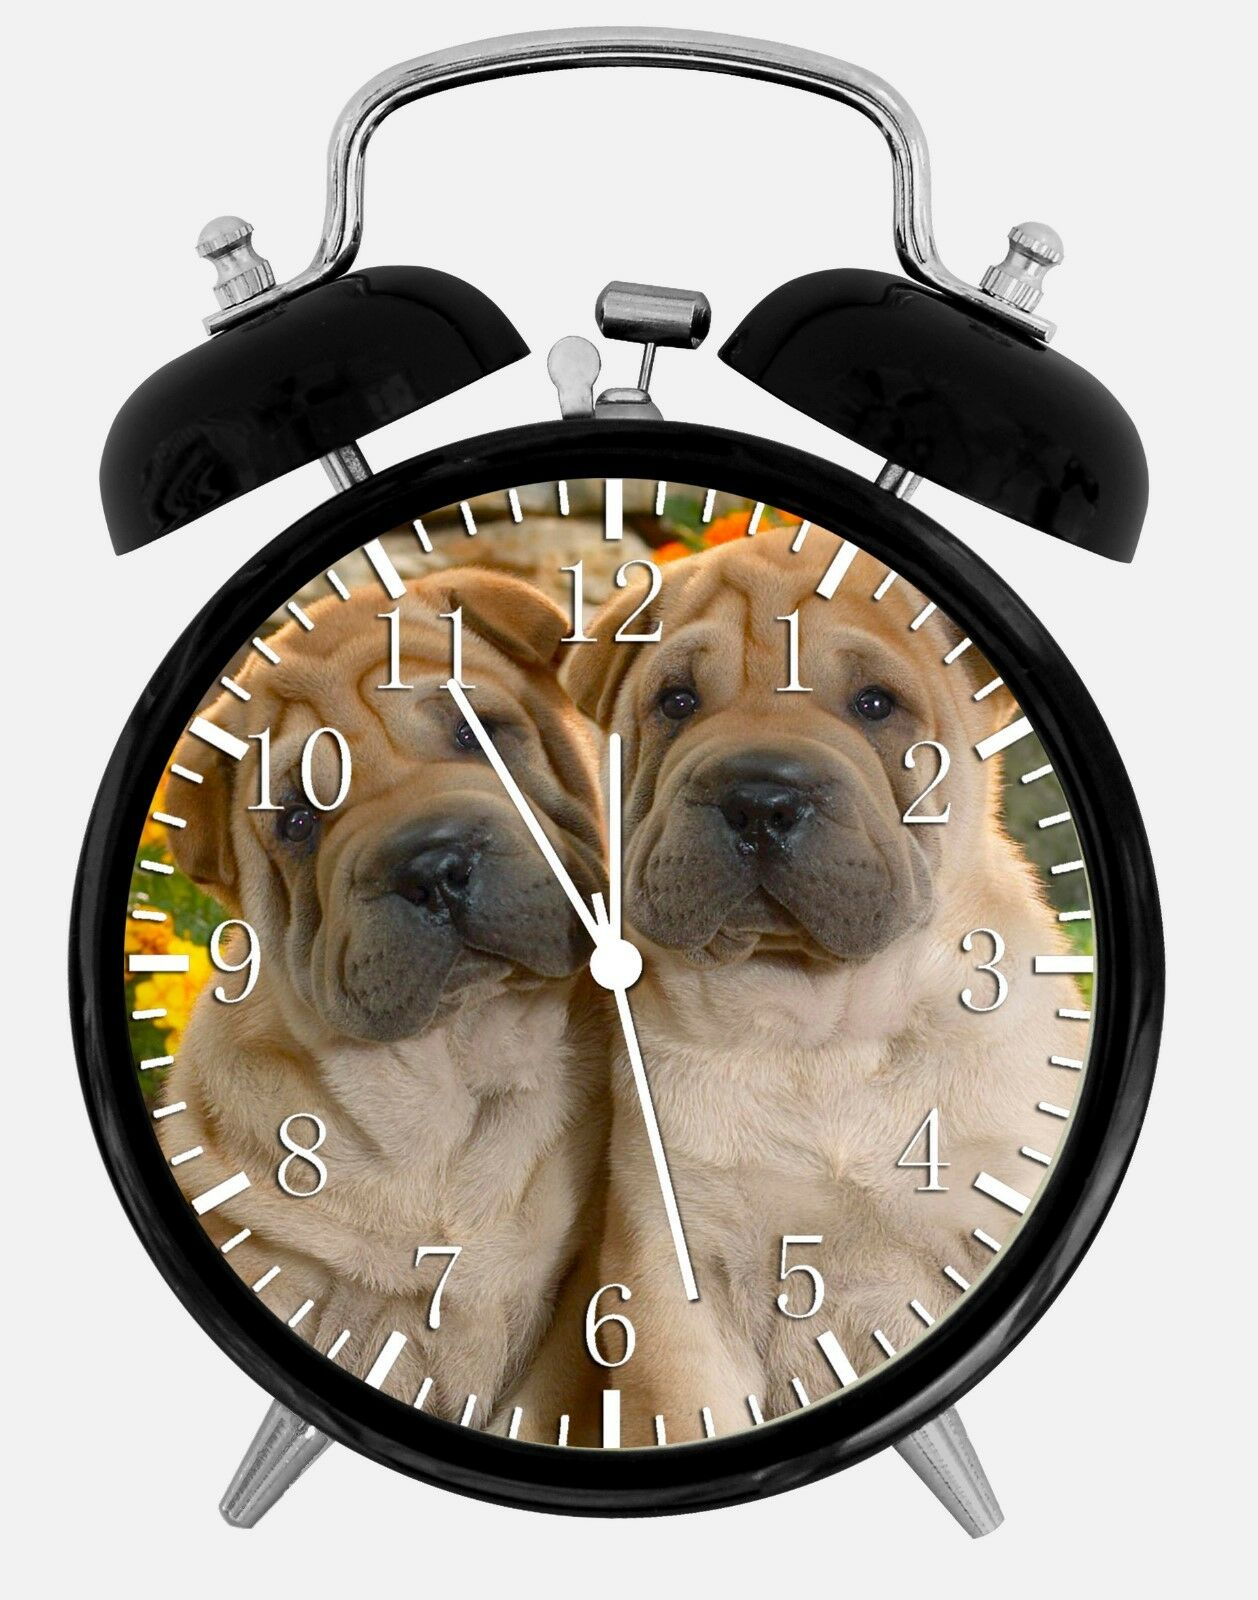 "Cute Shar Pei Alarm Desk Clock 3.75"" Room Office Decor W262 Nice For Gift"